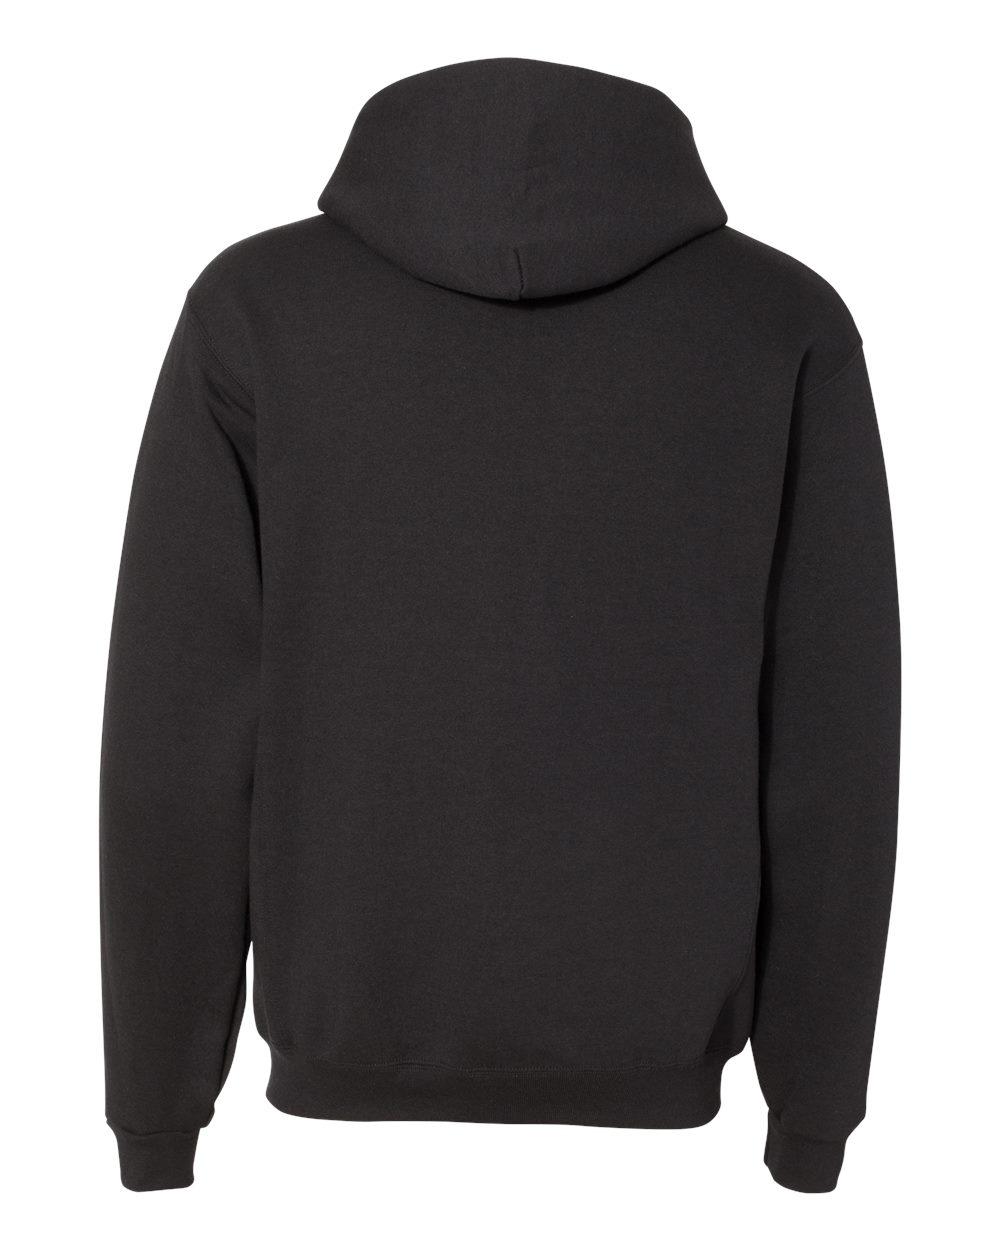 Russell-Athletic-Blank-Plain-Hooded-Full-Zip-Sweatshirt-697HBM-up-to-3XL thumbnail 7